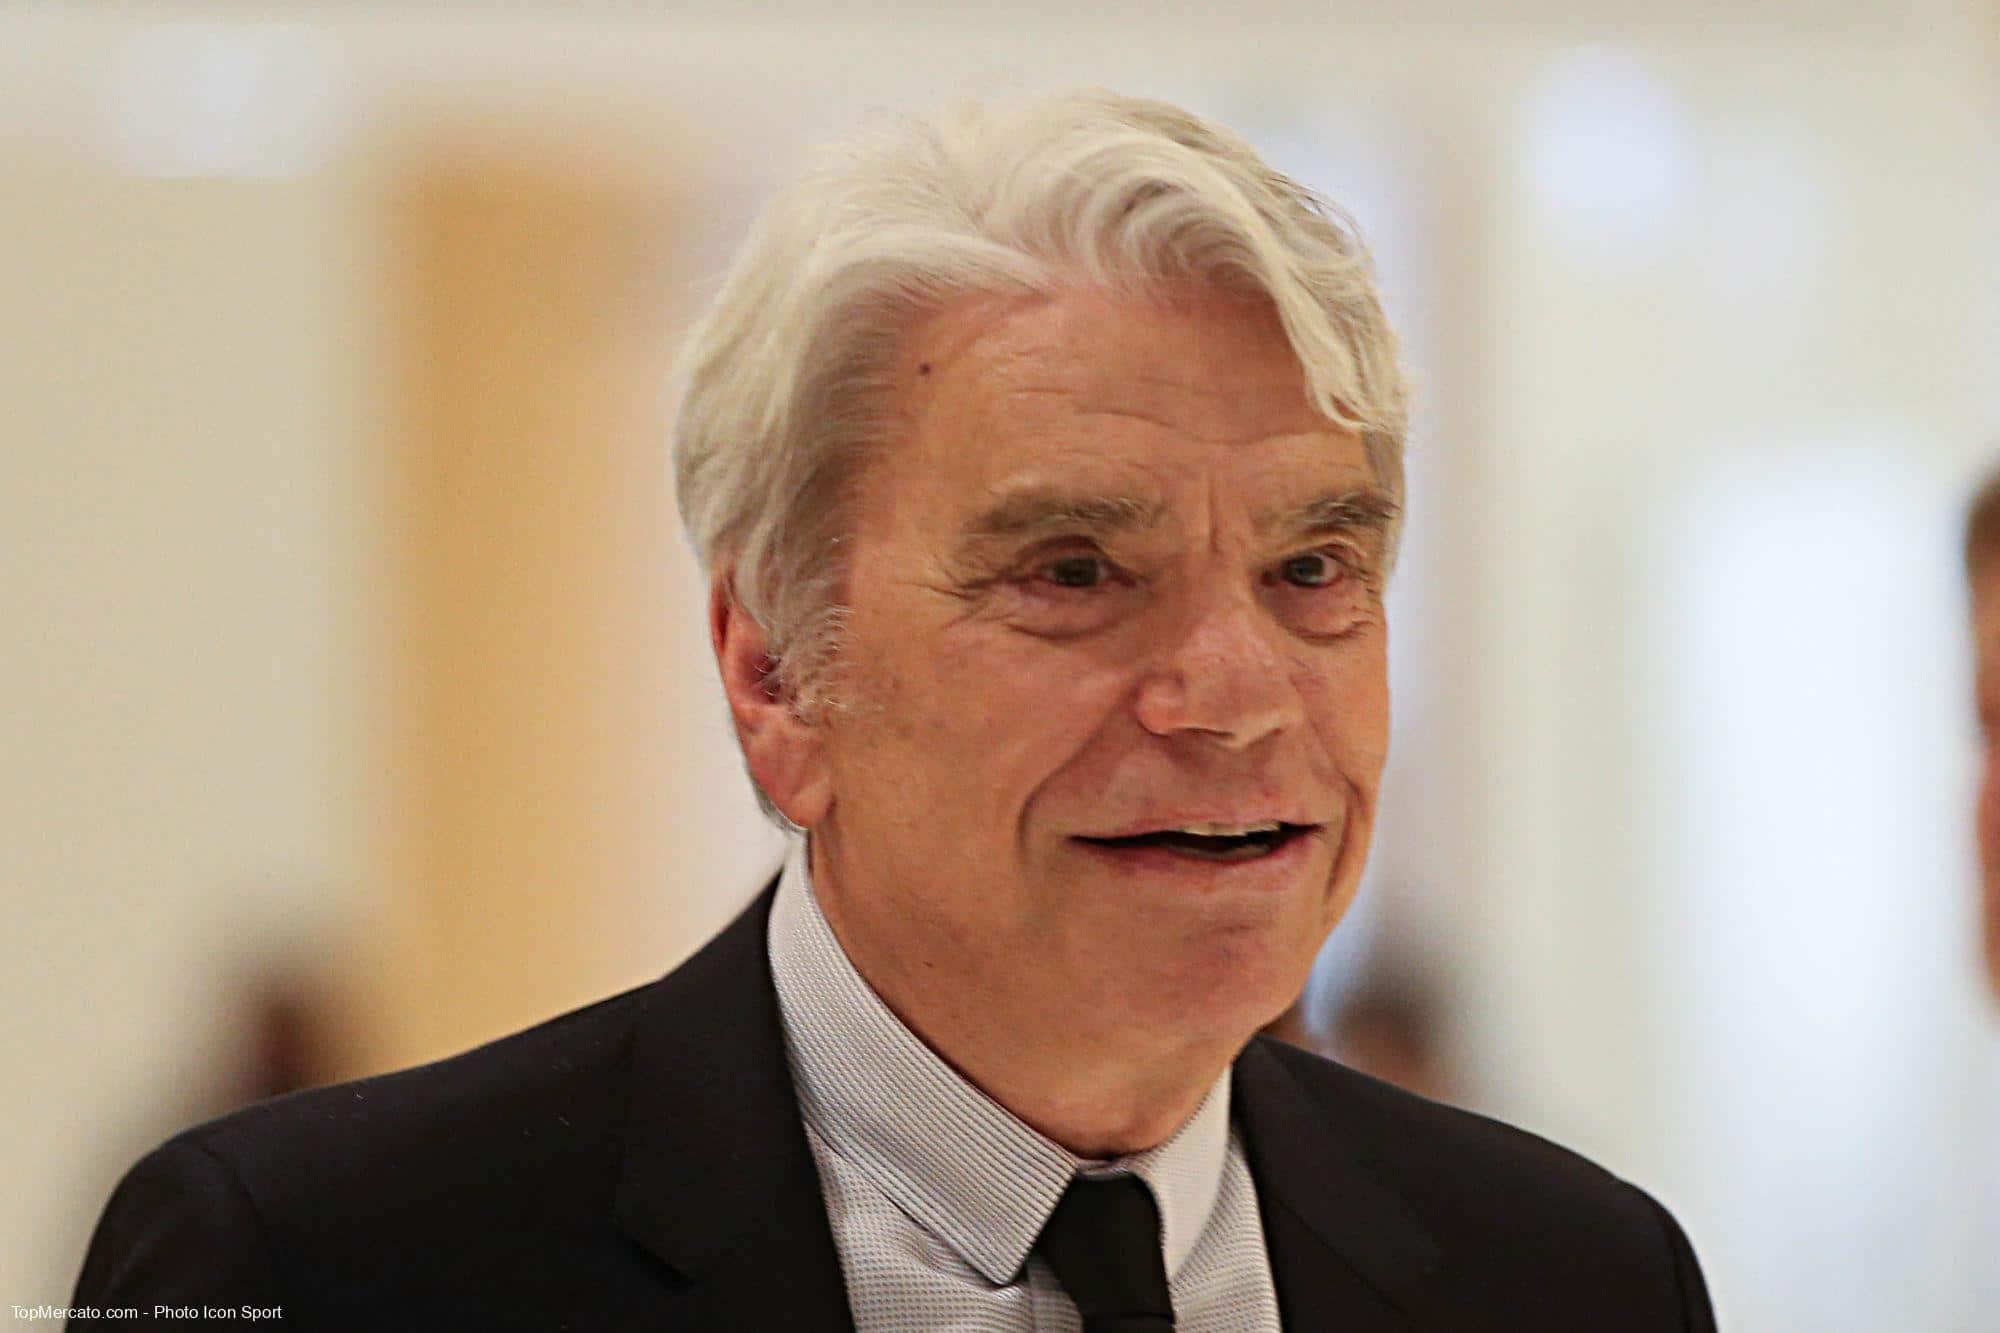 Bernard Tapie